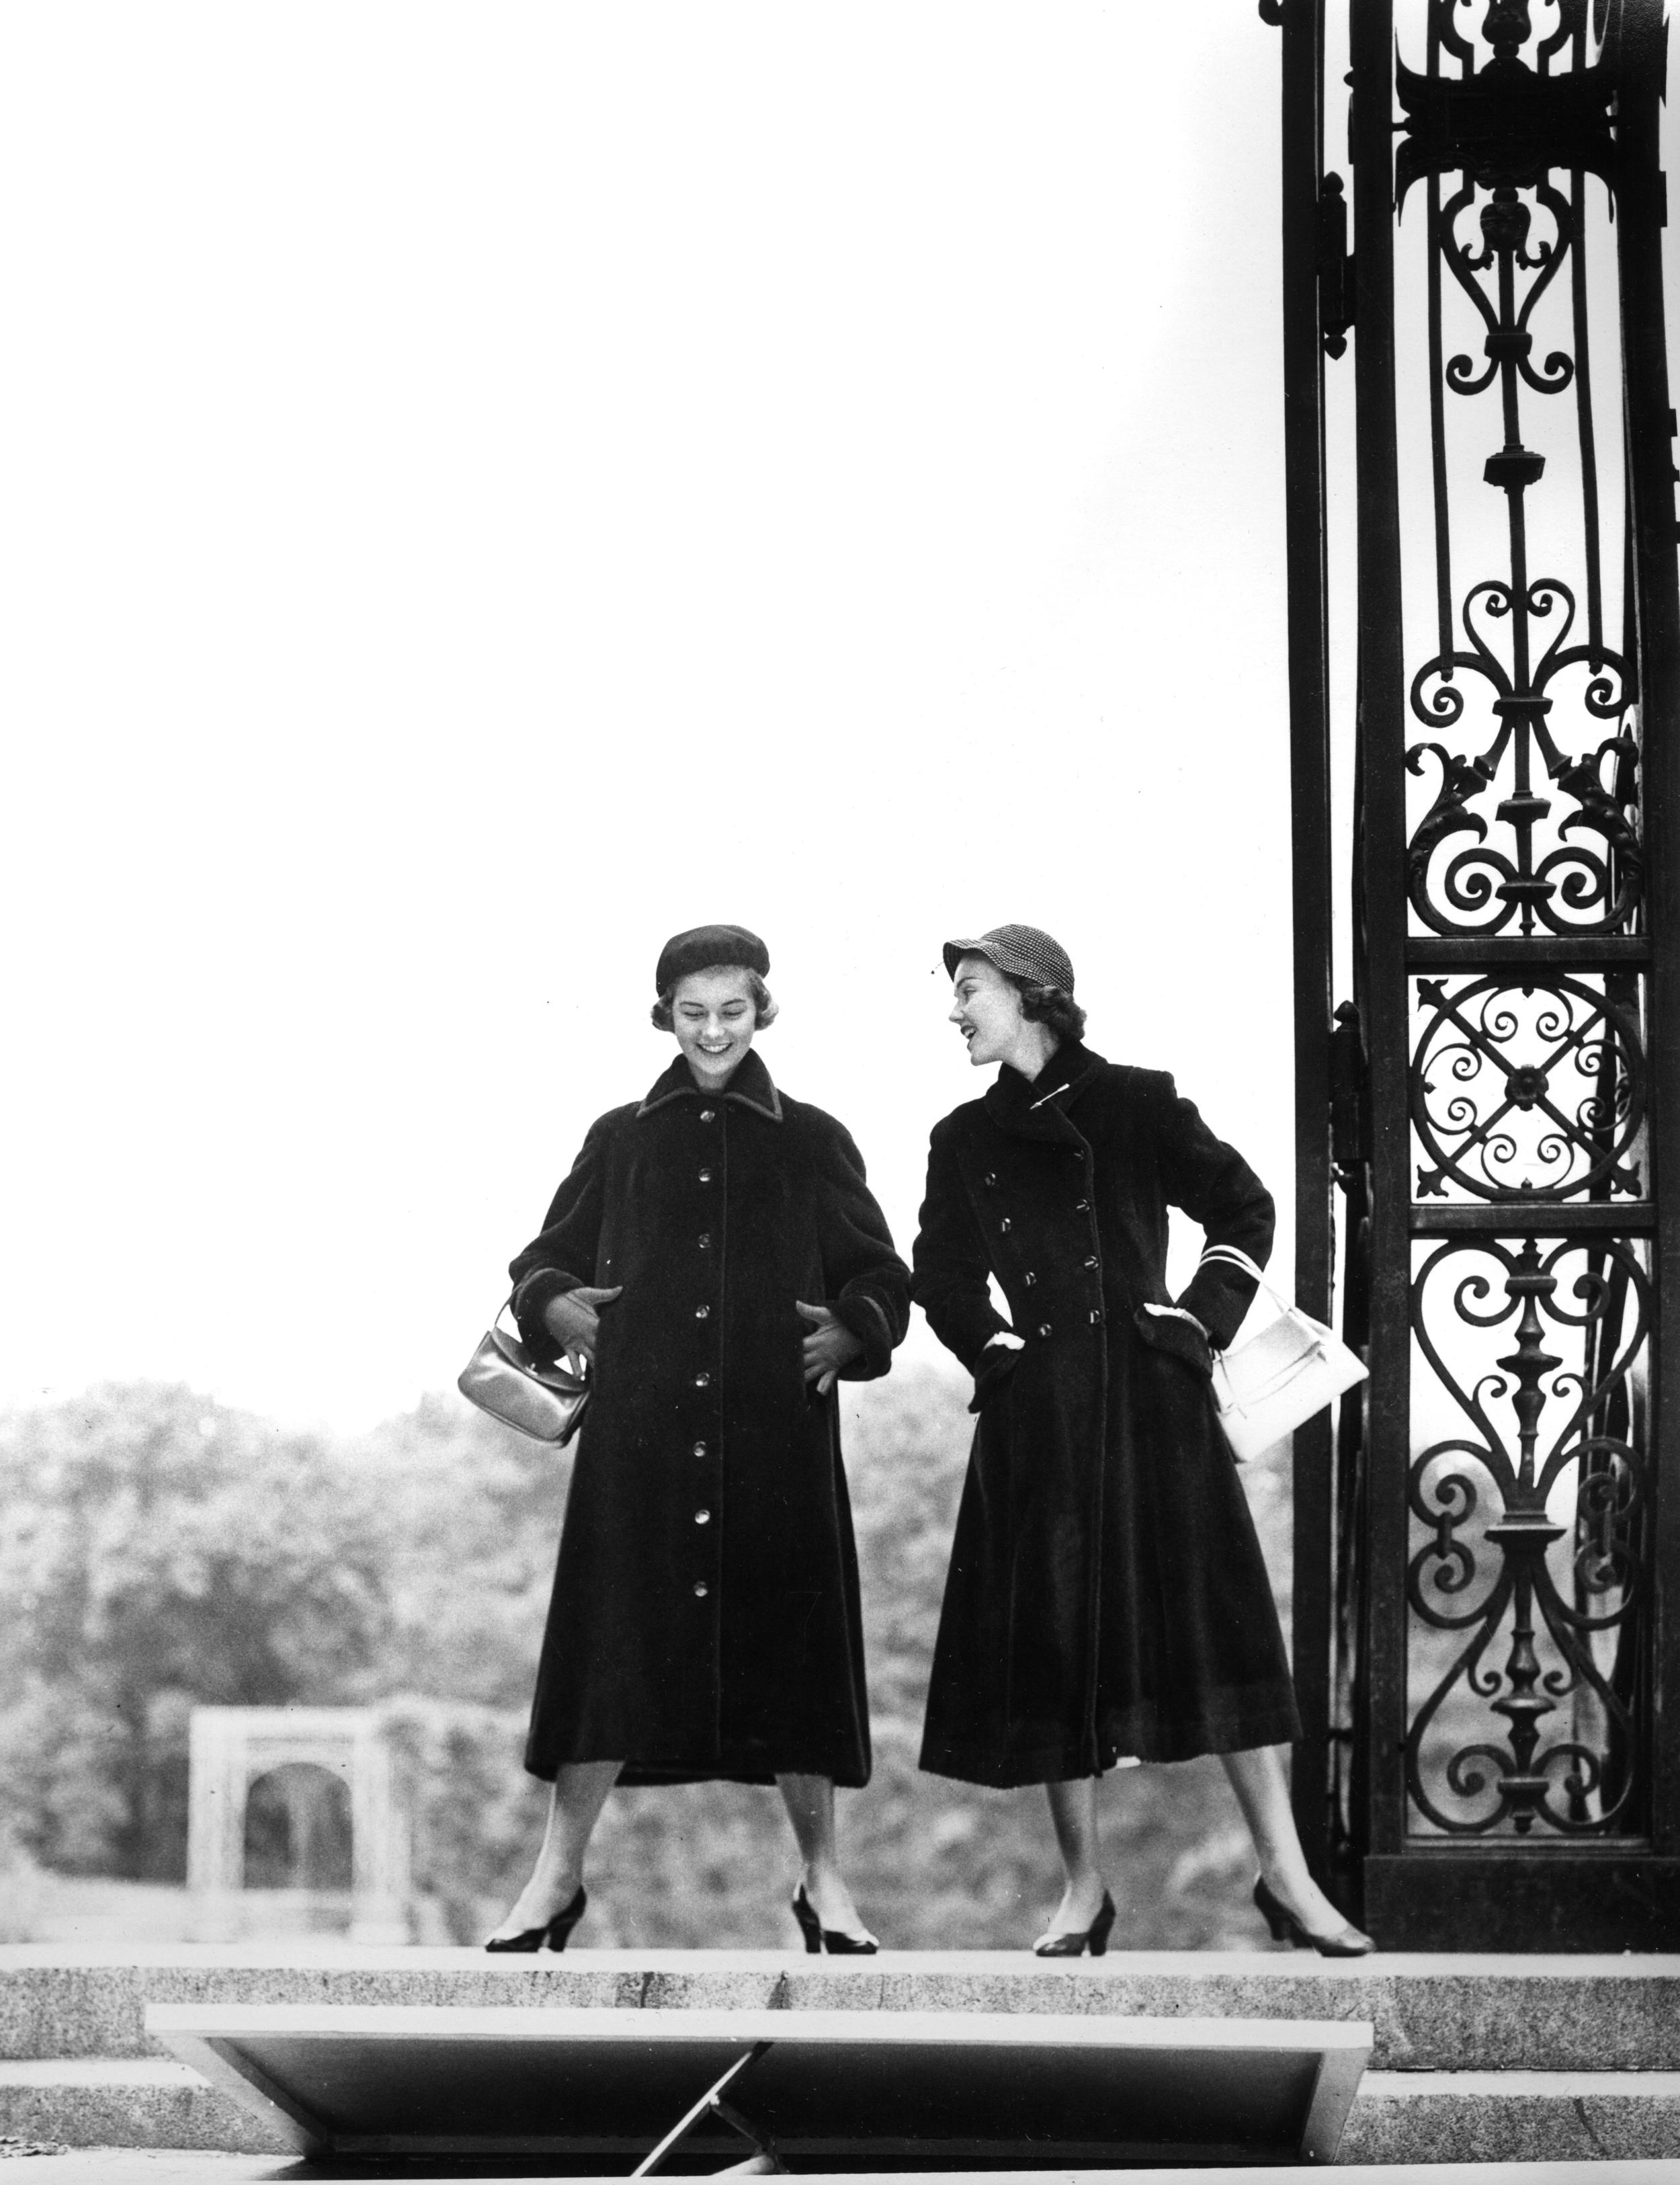 13_1_Two Woman Standing Next to a Gate_Dan Wynn Archive 2.jpeg